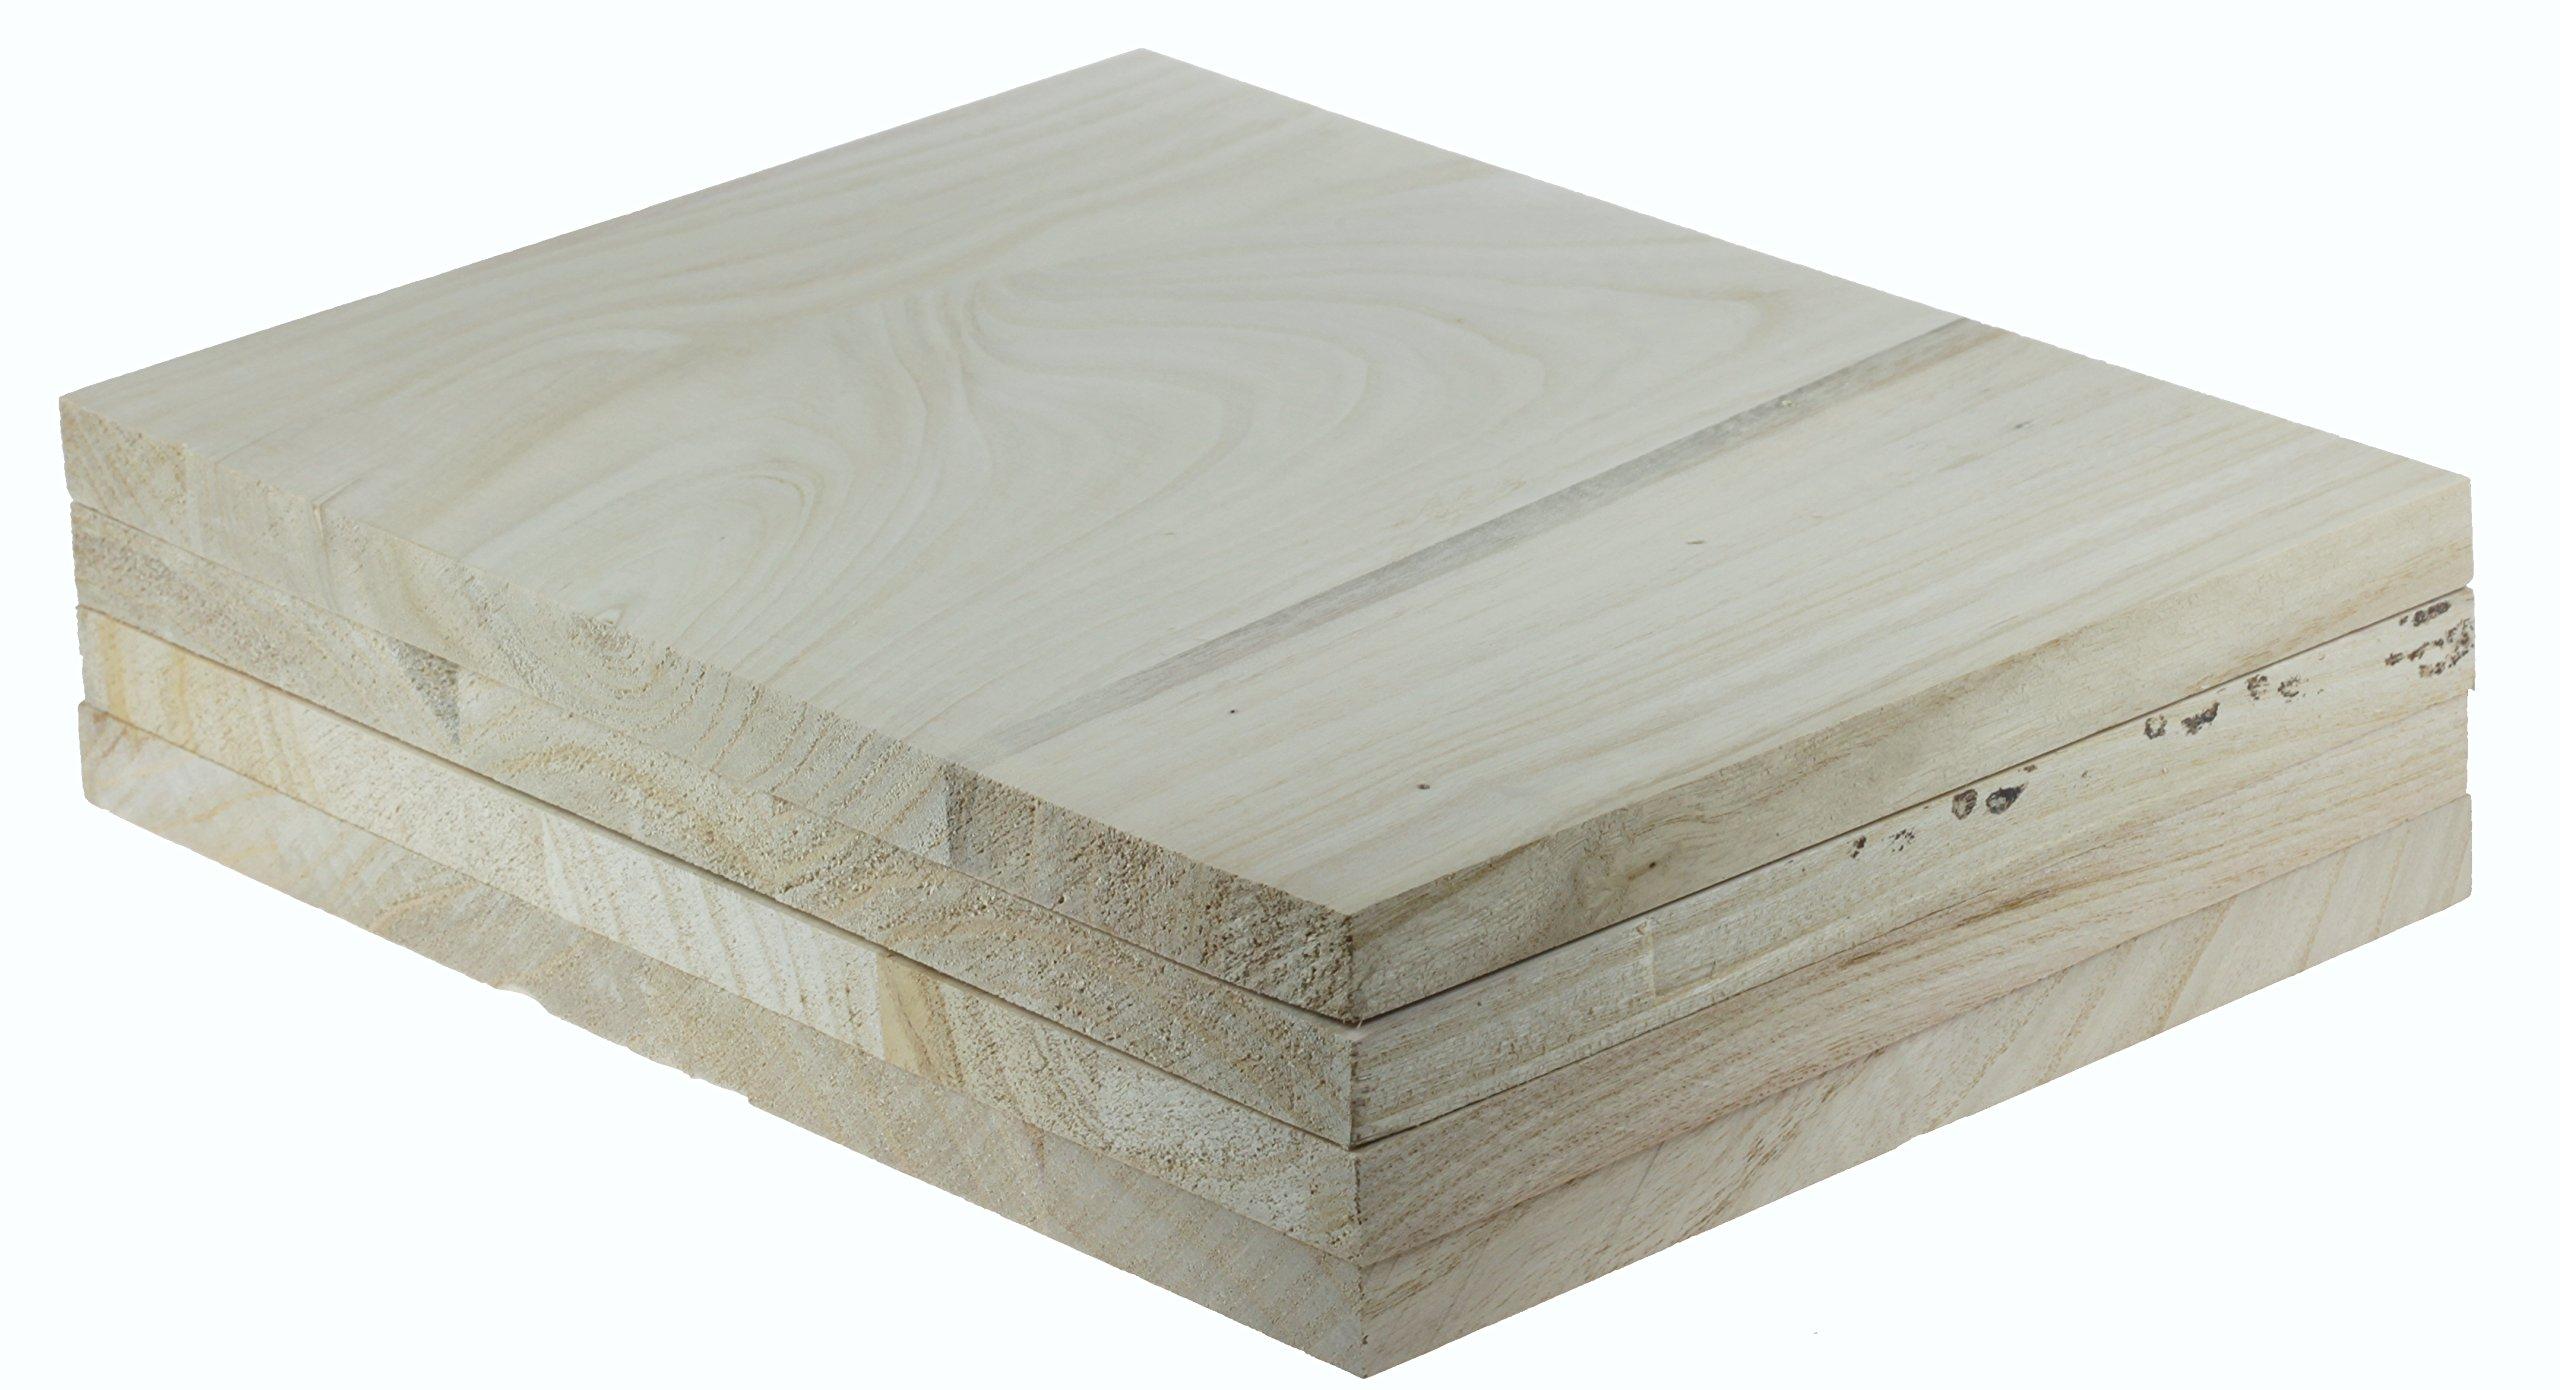 Tiger Claw Wood Breaking Board - Breakable Board in 18 mm Thickness (4 Board Pack)